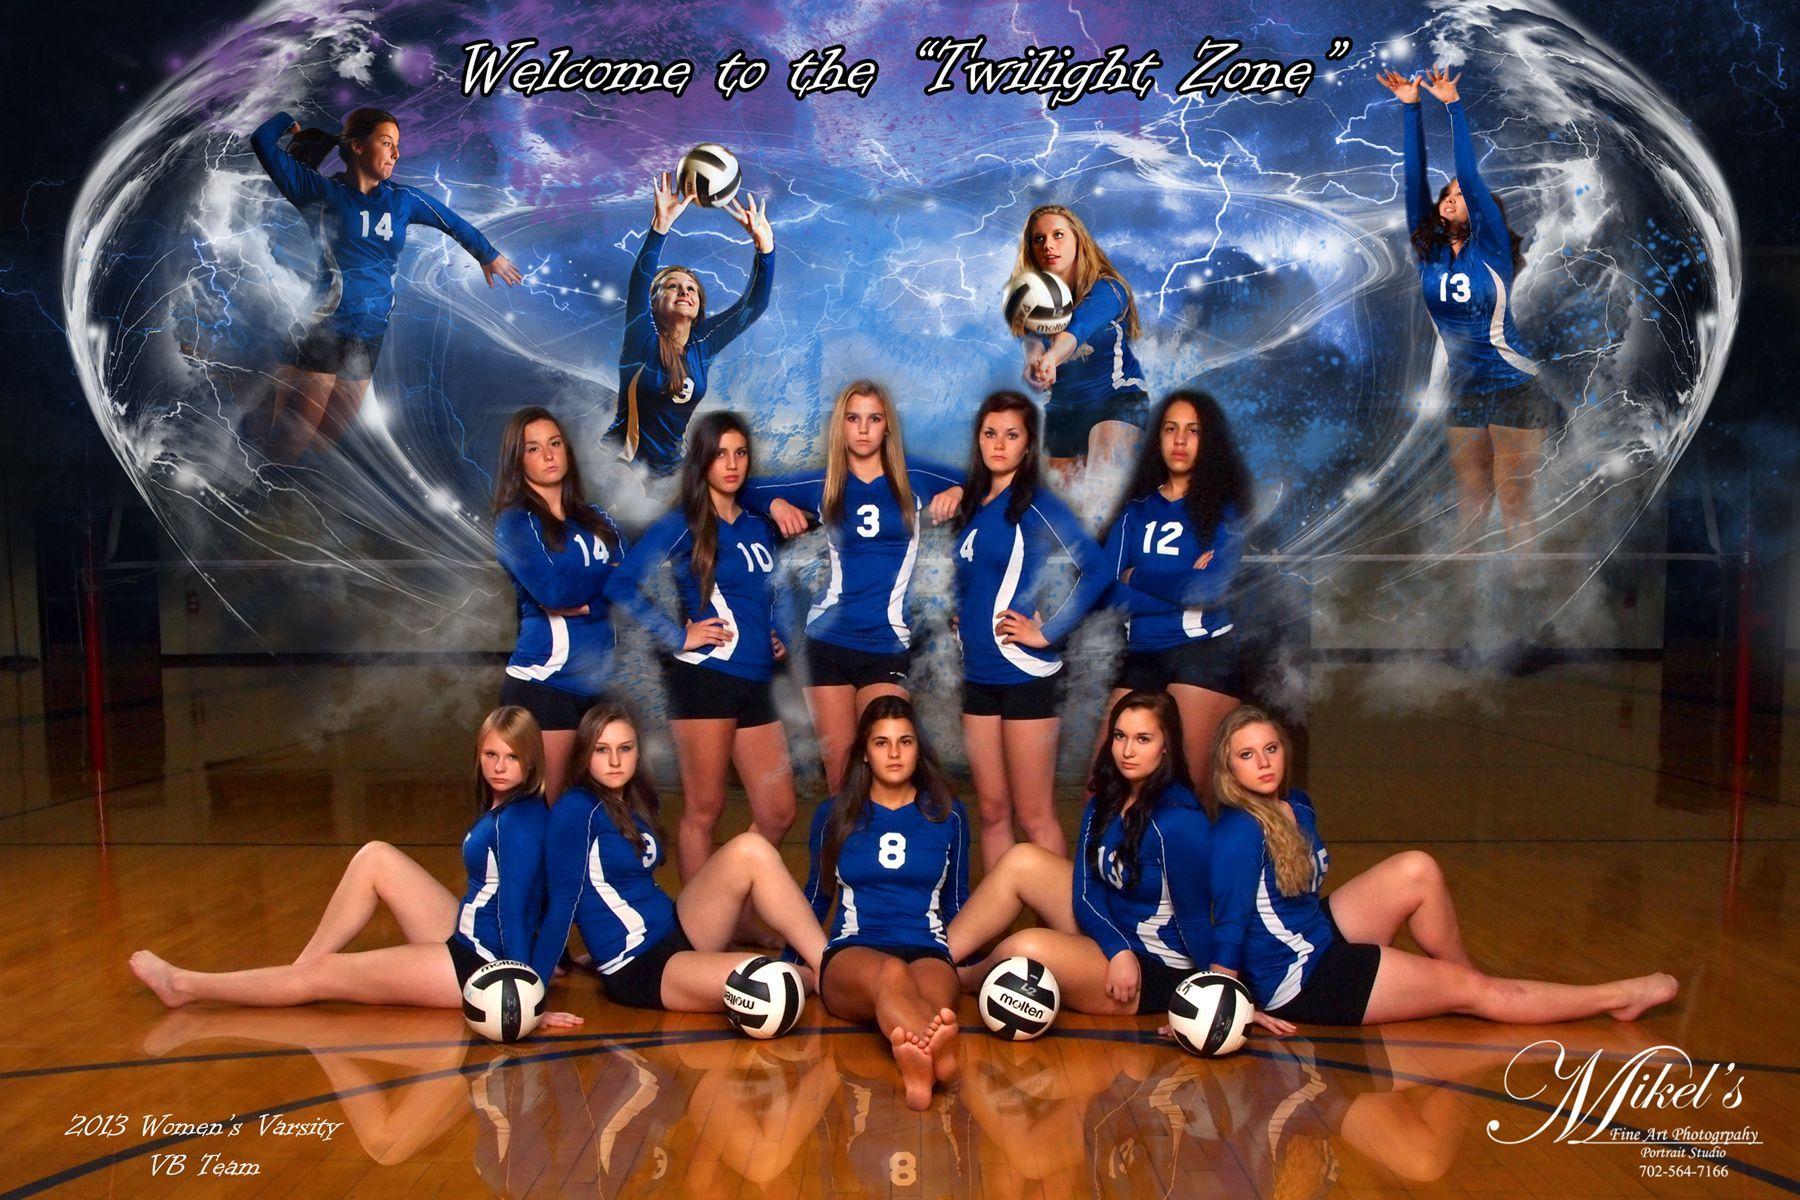 Best 25 Volleyball Team Photos Ideas On Pinterest Volleyball Team Photos Volleyball Team Pictures Sports Team Photography